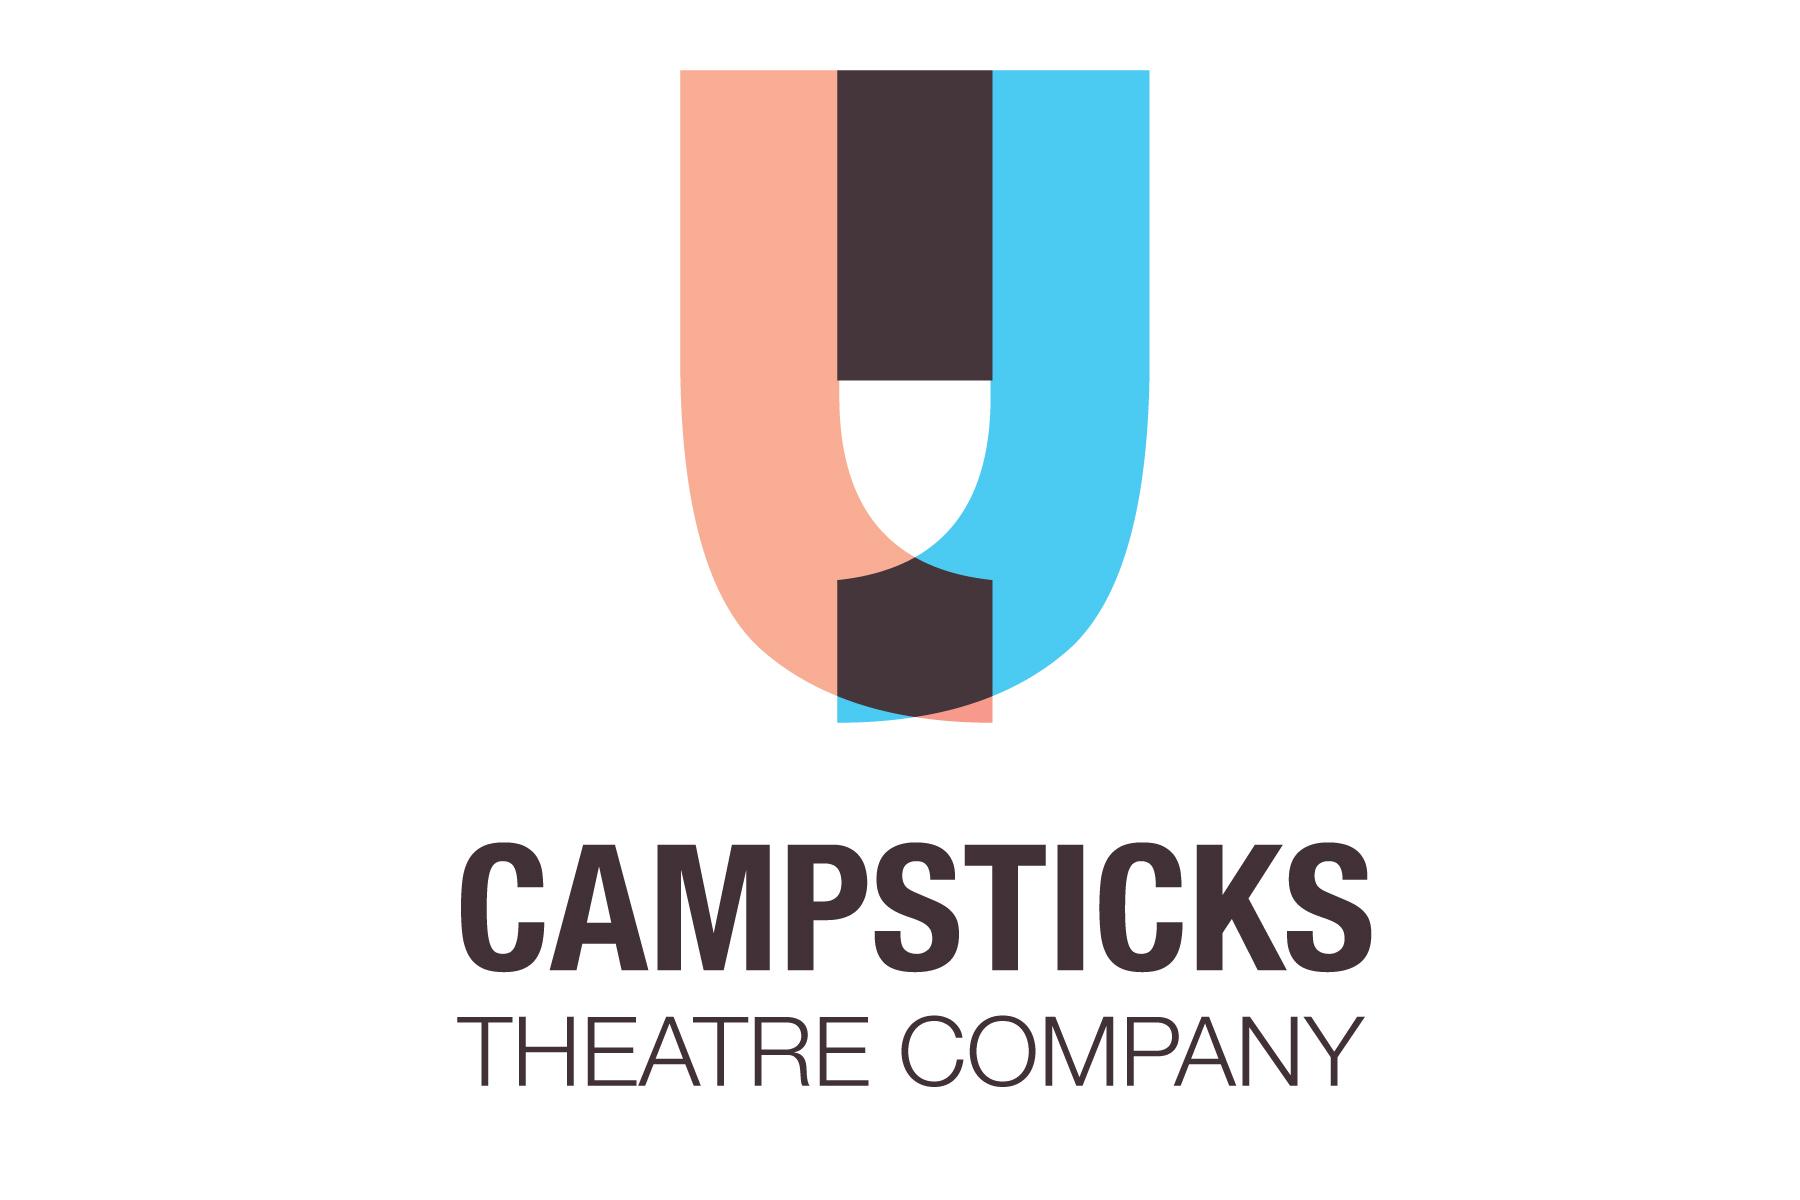 Campsticks-brand-logo.jpg